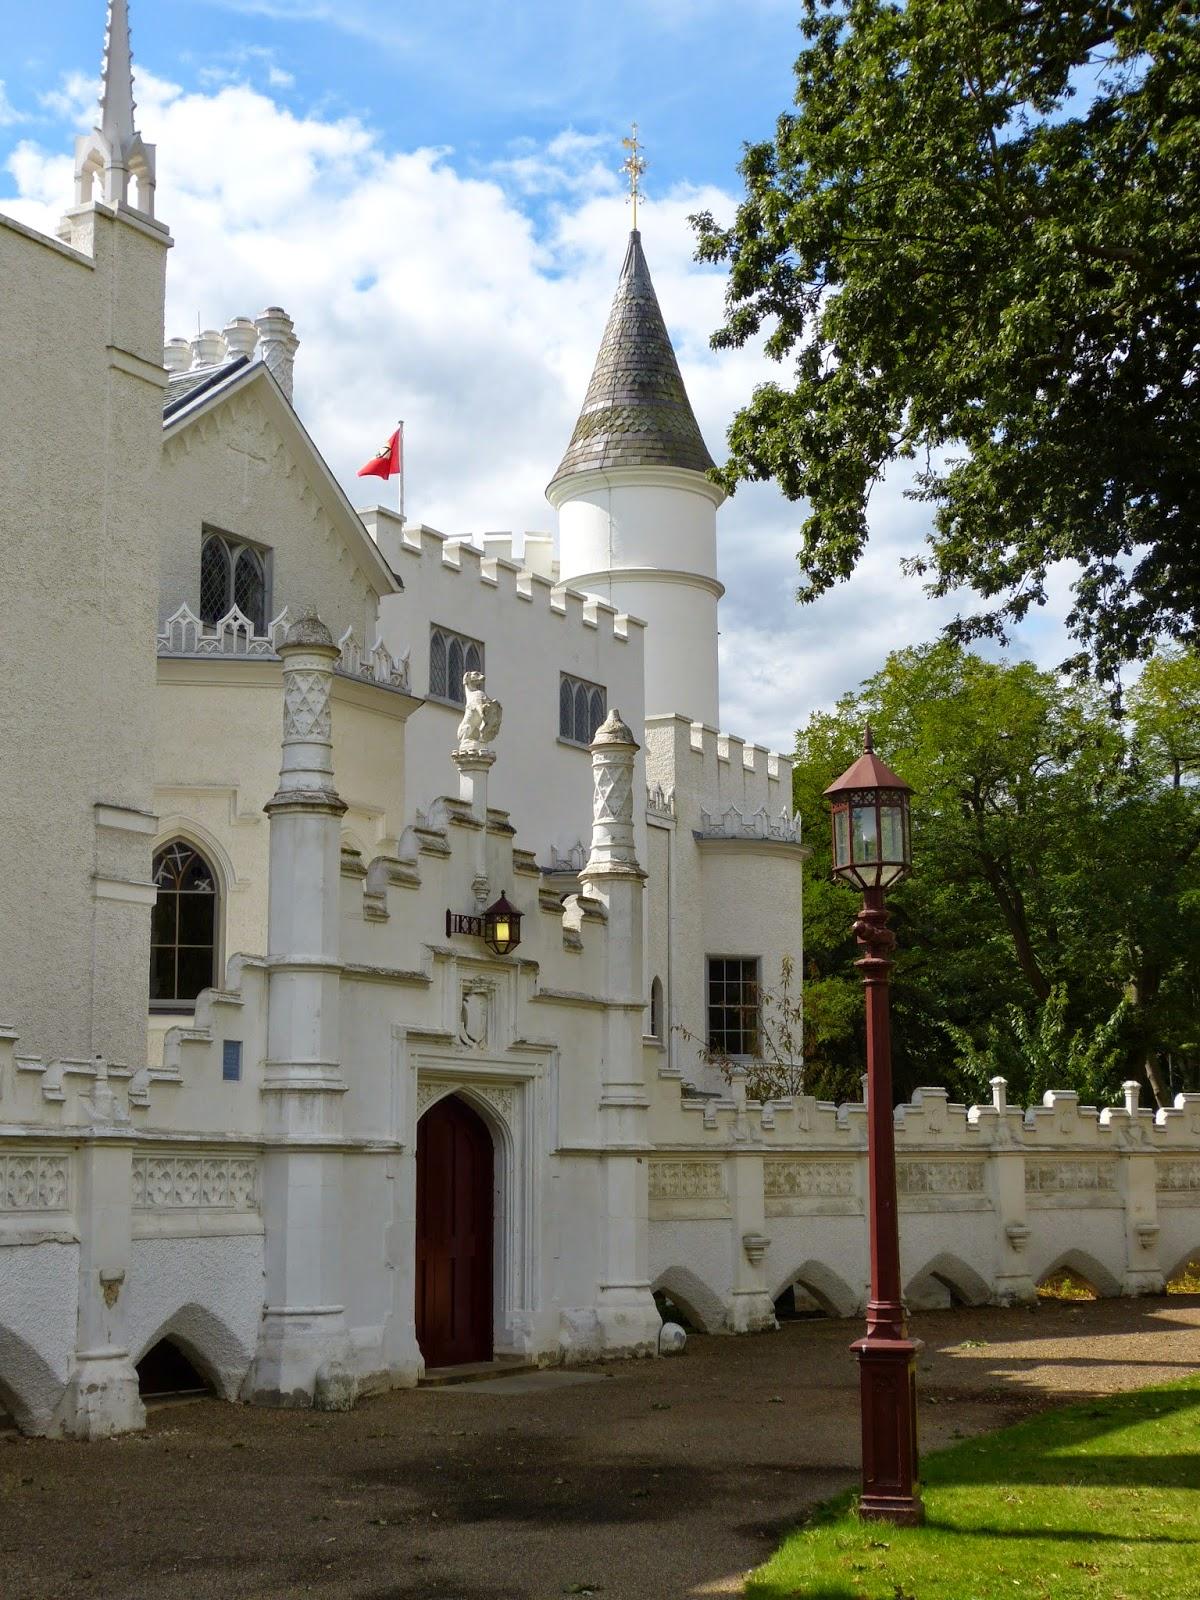 Entrance gate, Strawberry Hill